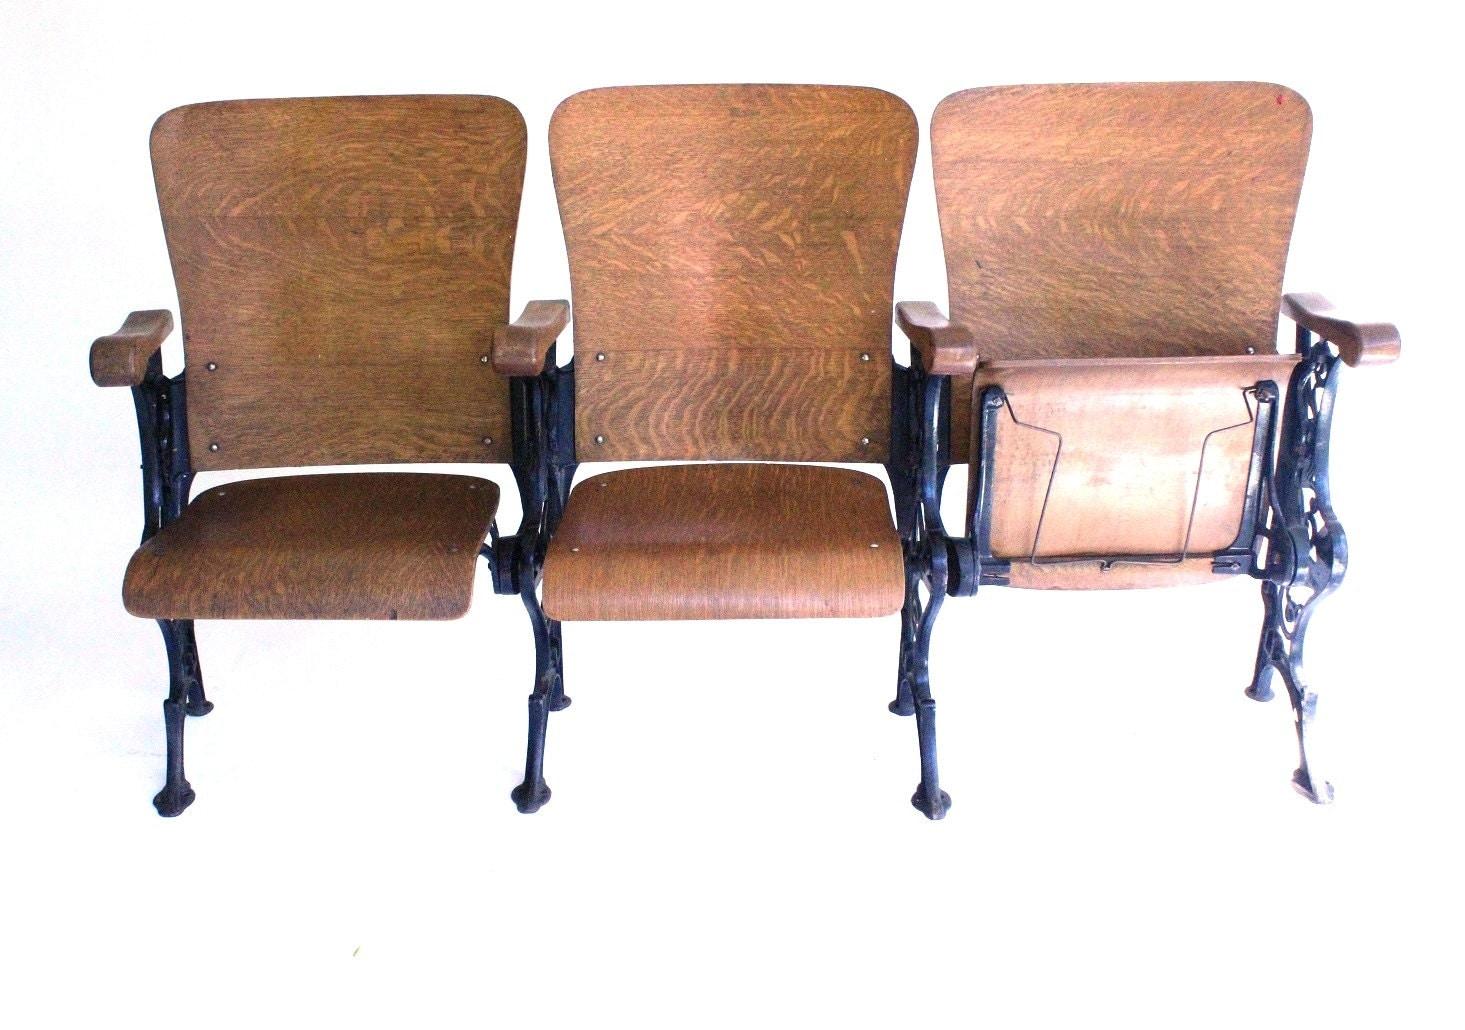 Vintage Theatre Seats 115